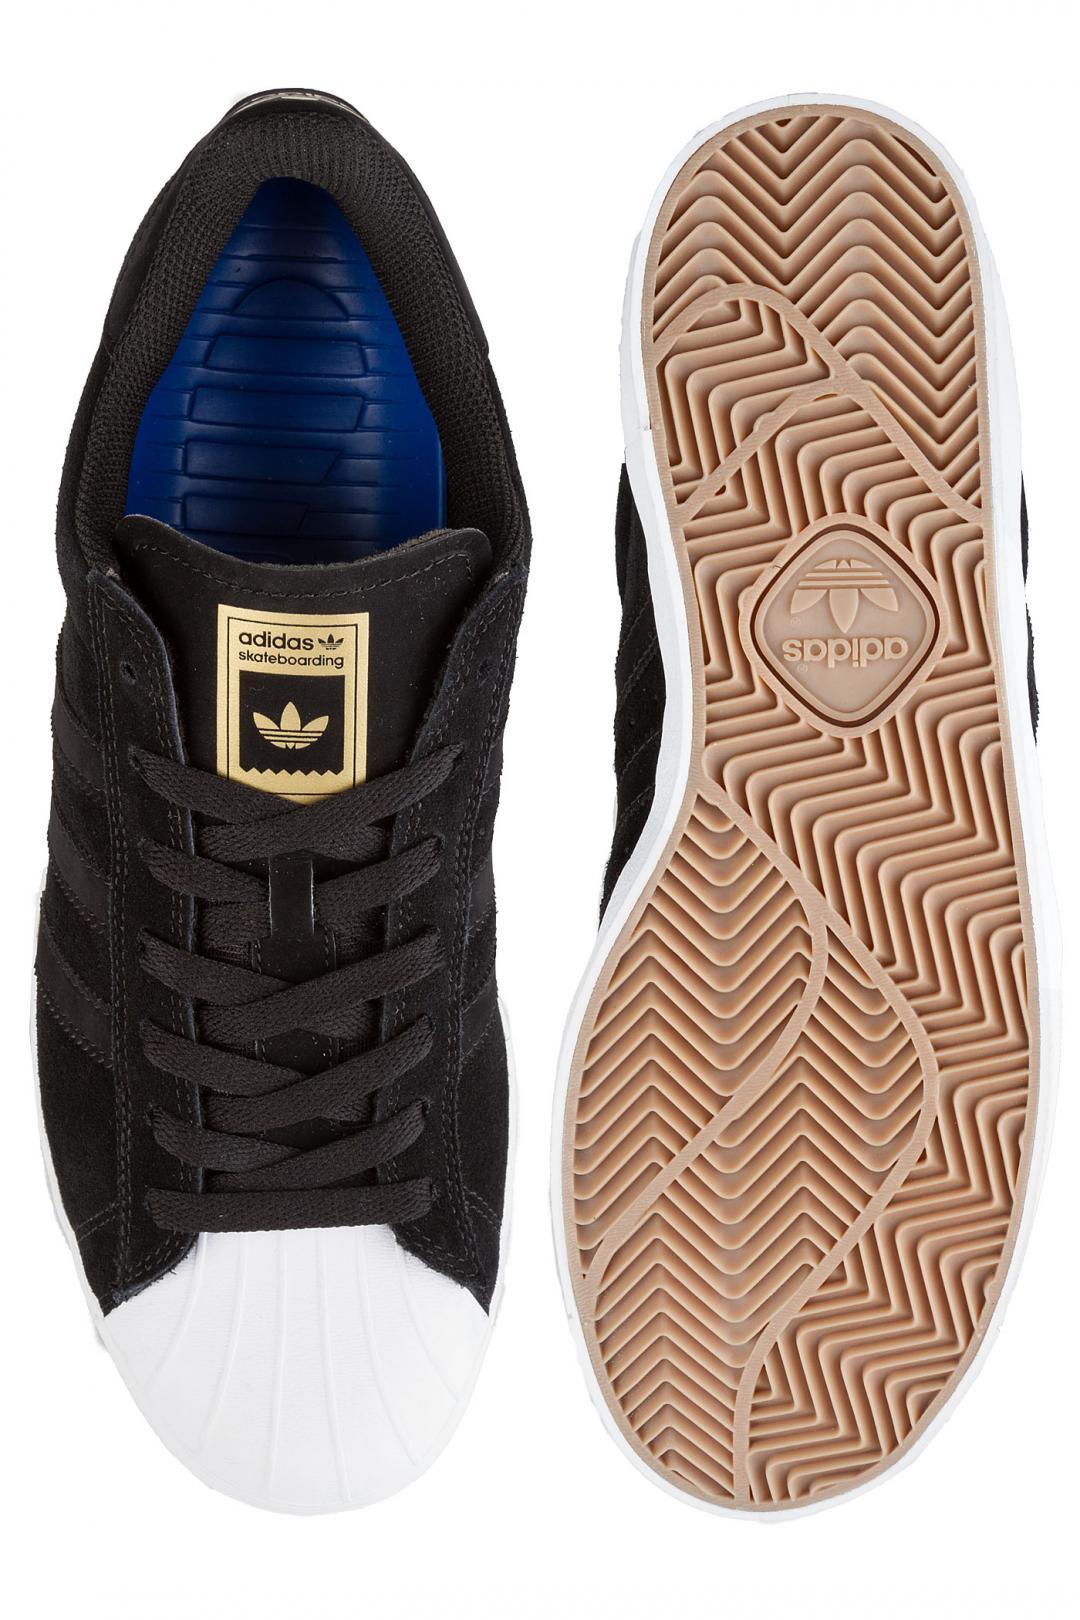 Uomo adidas Superstar Vulc ADV core black white gold | Scarpe da skate